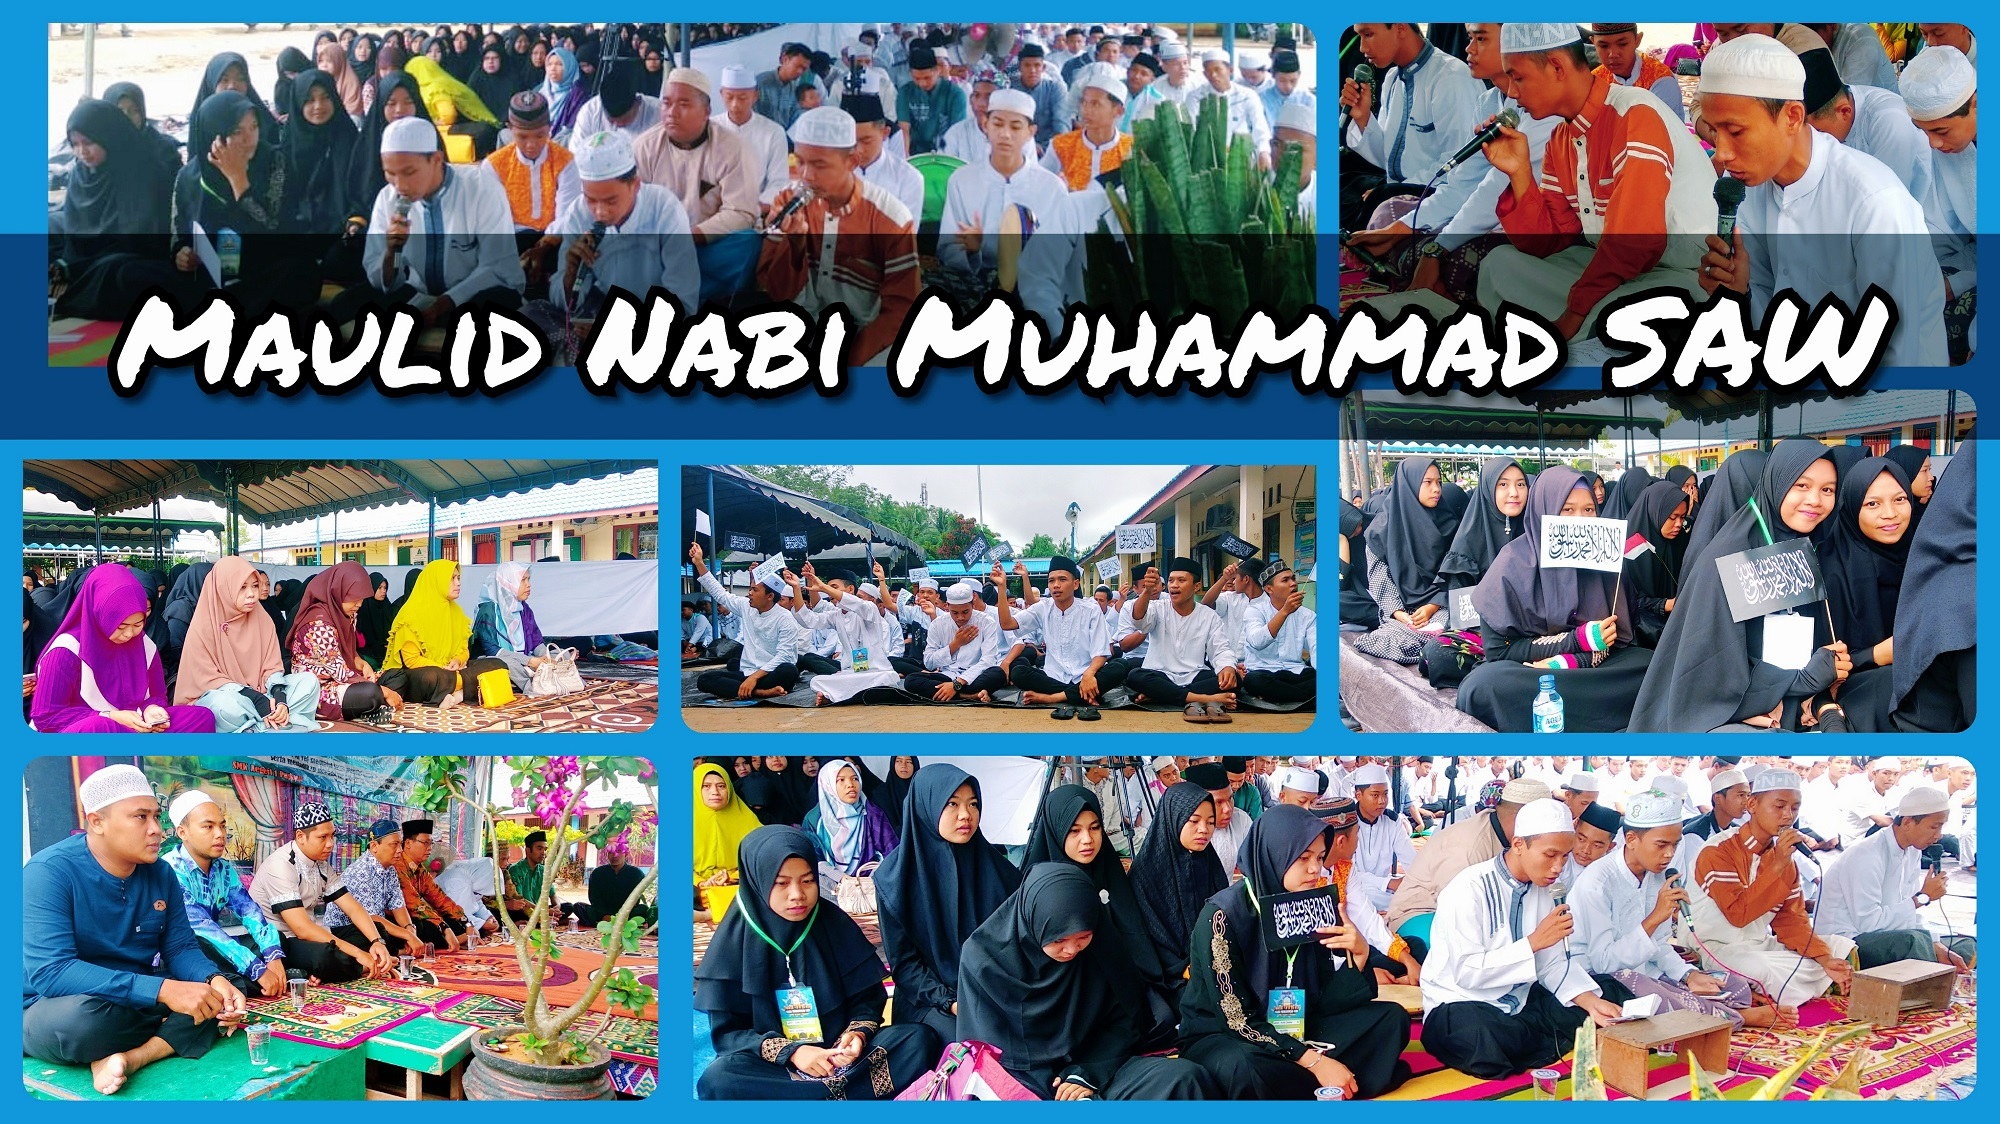 Siswa dan Guru SMKN 1 Pugaan Peringatan Maulid Nabi Muhammad SAW 1440 H